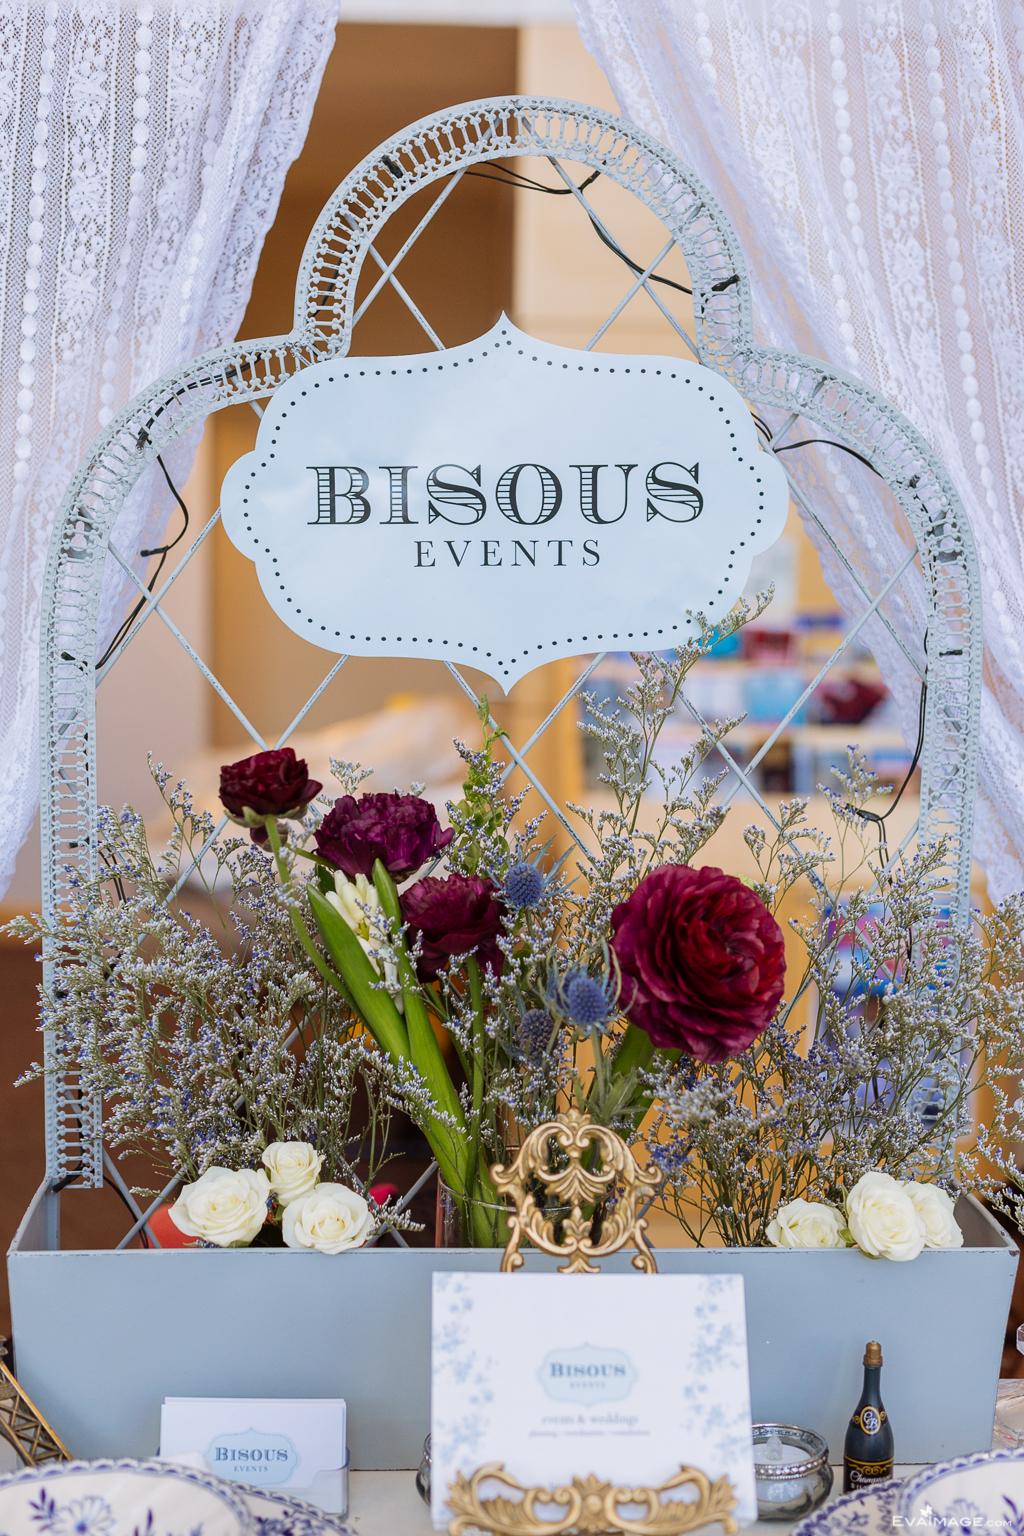 Ontario Bridal Show Photo Coverage